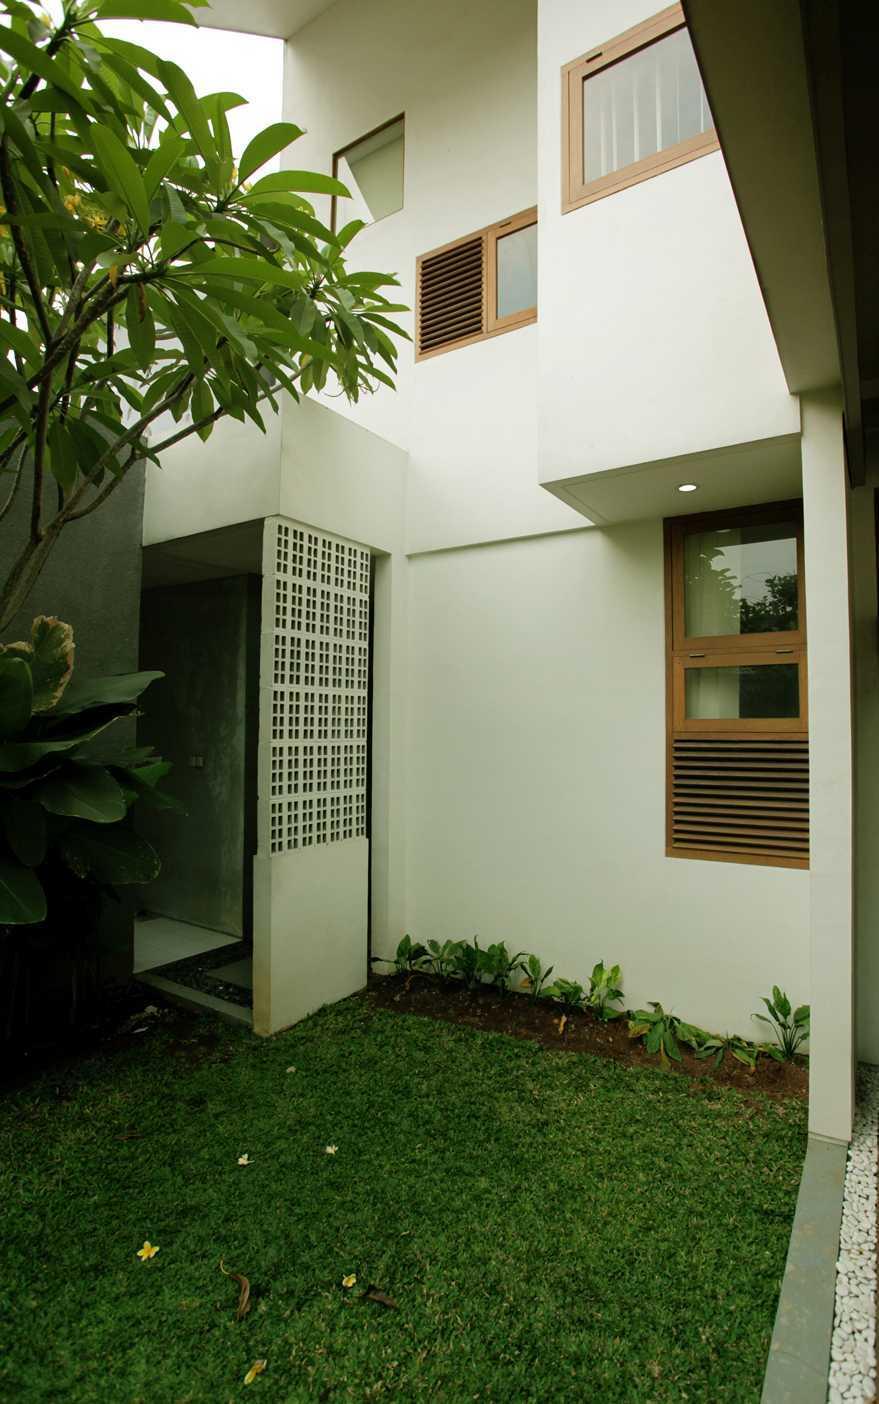 Armeyn Ilyas Doctor House Kelapa Dua Wetan, Ciracas, East Jakarta City, Jakarta, Indonesia Jakarta Backyard Modern  17738